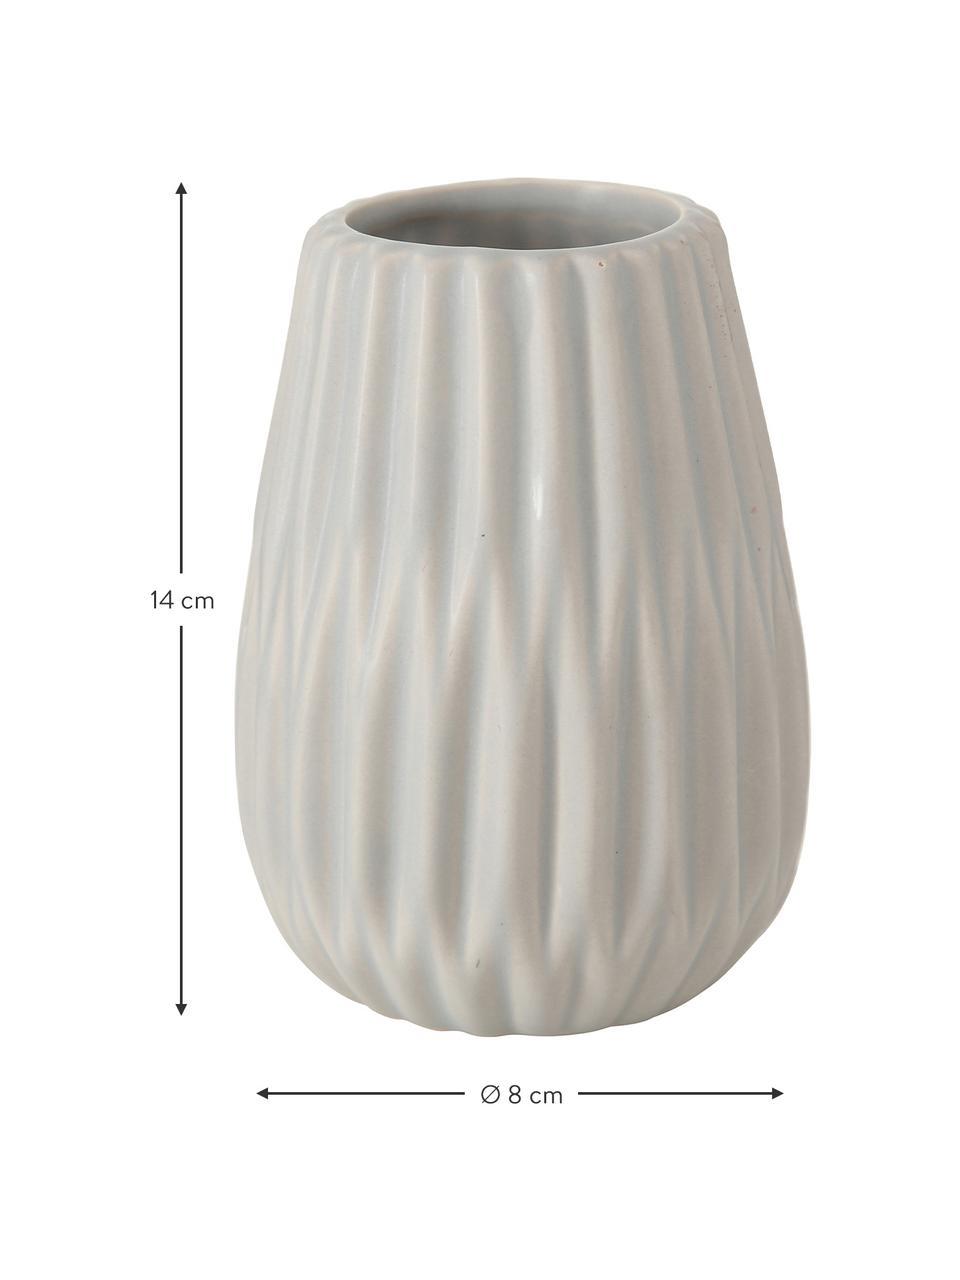 Petit vase Wilma, 3élém., Gris, blanc, rose